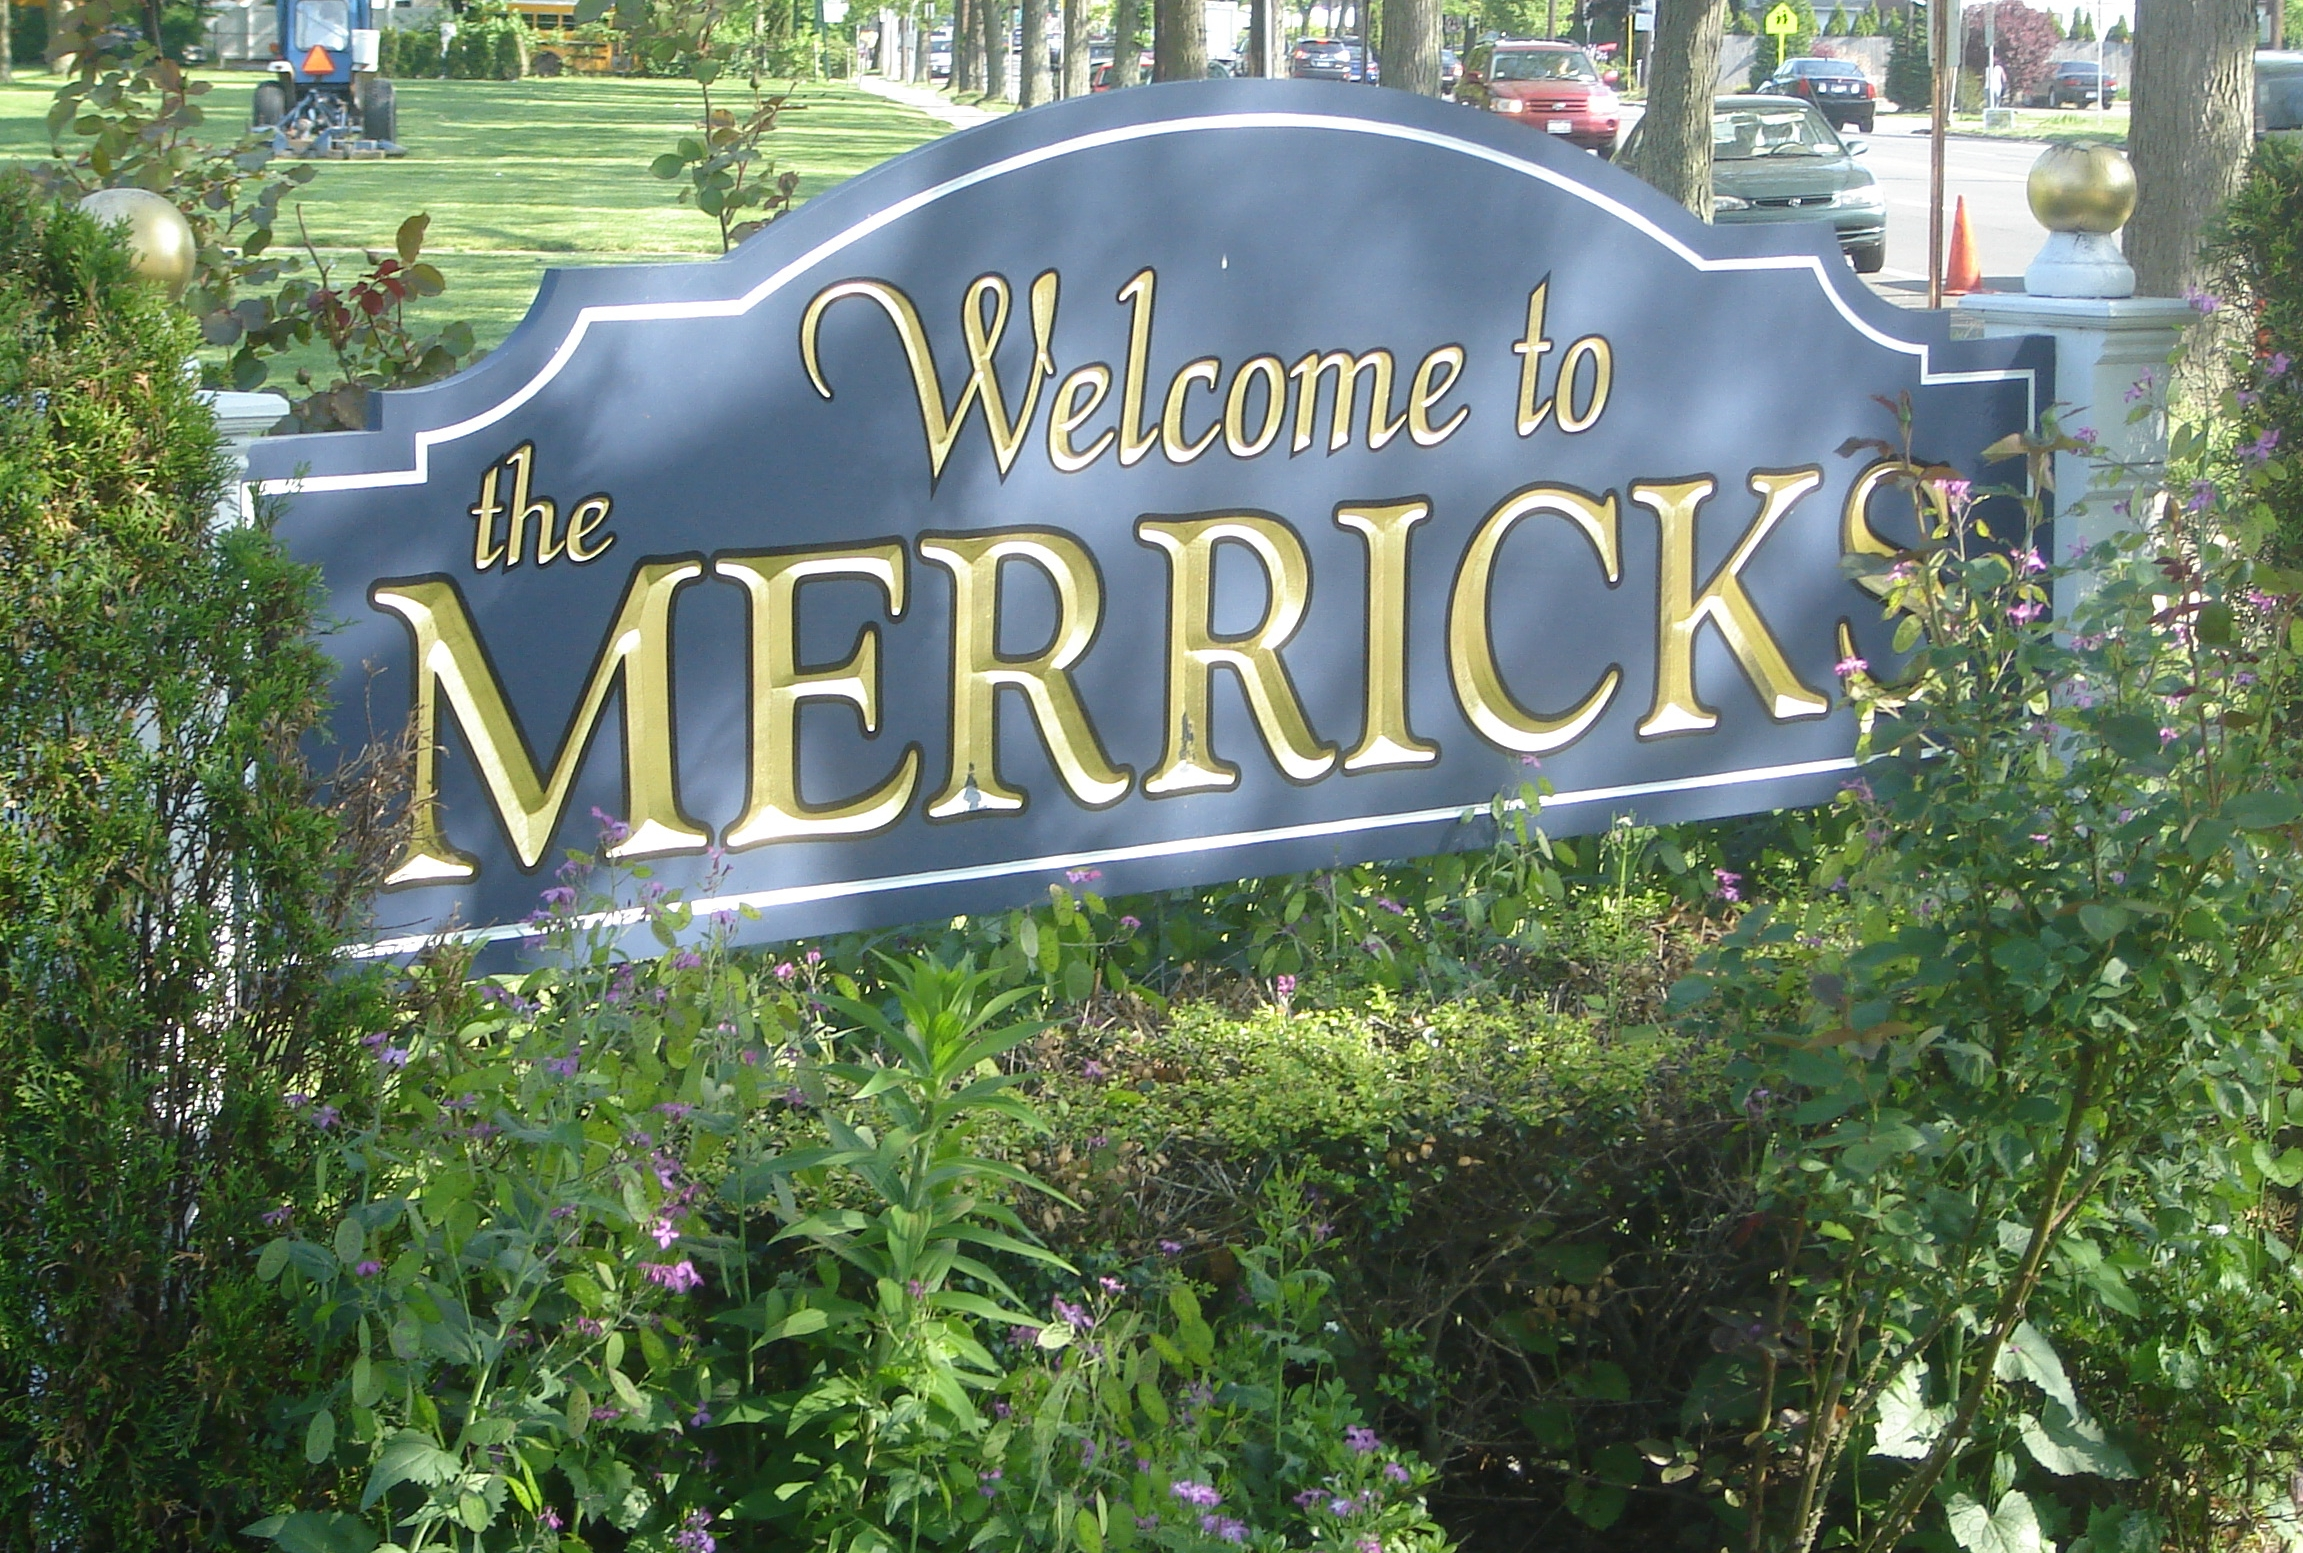 Merrick (Nueva York)